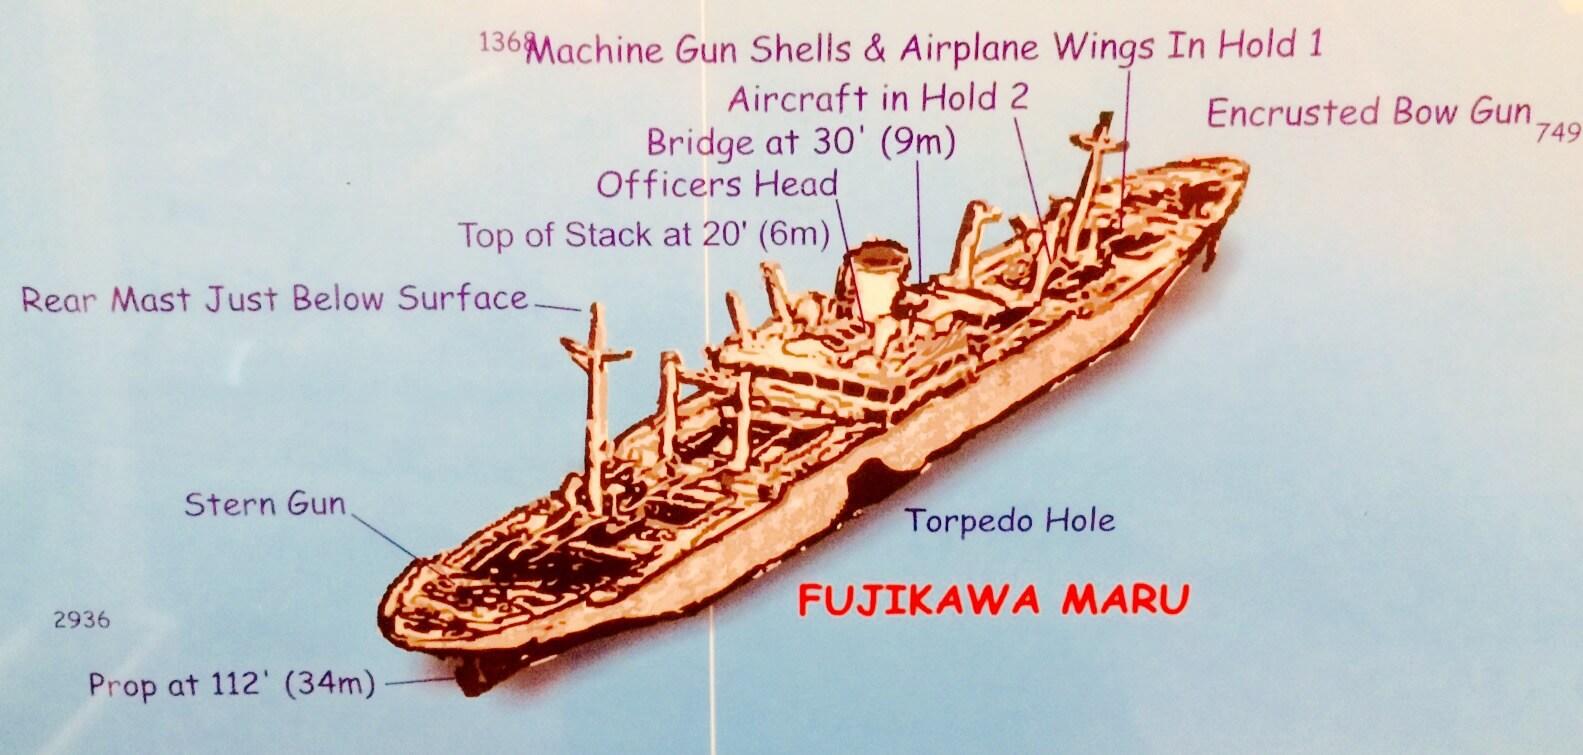 The Fujikawa Maru wreck which lies at the bottom of Chuuk lagoon.